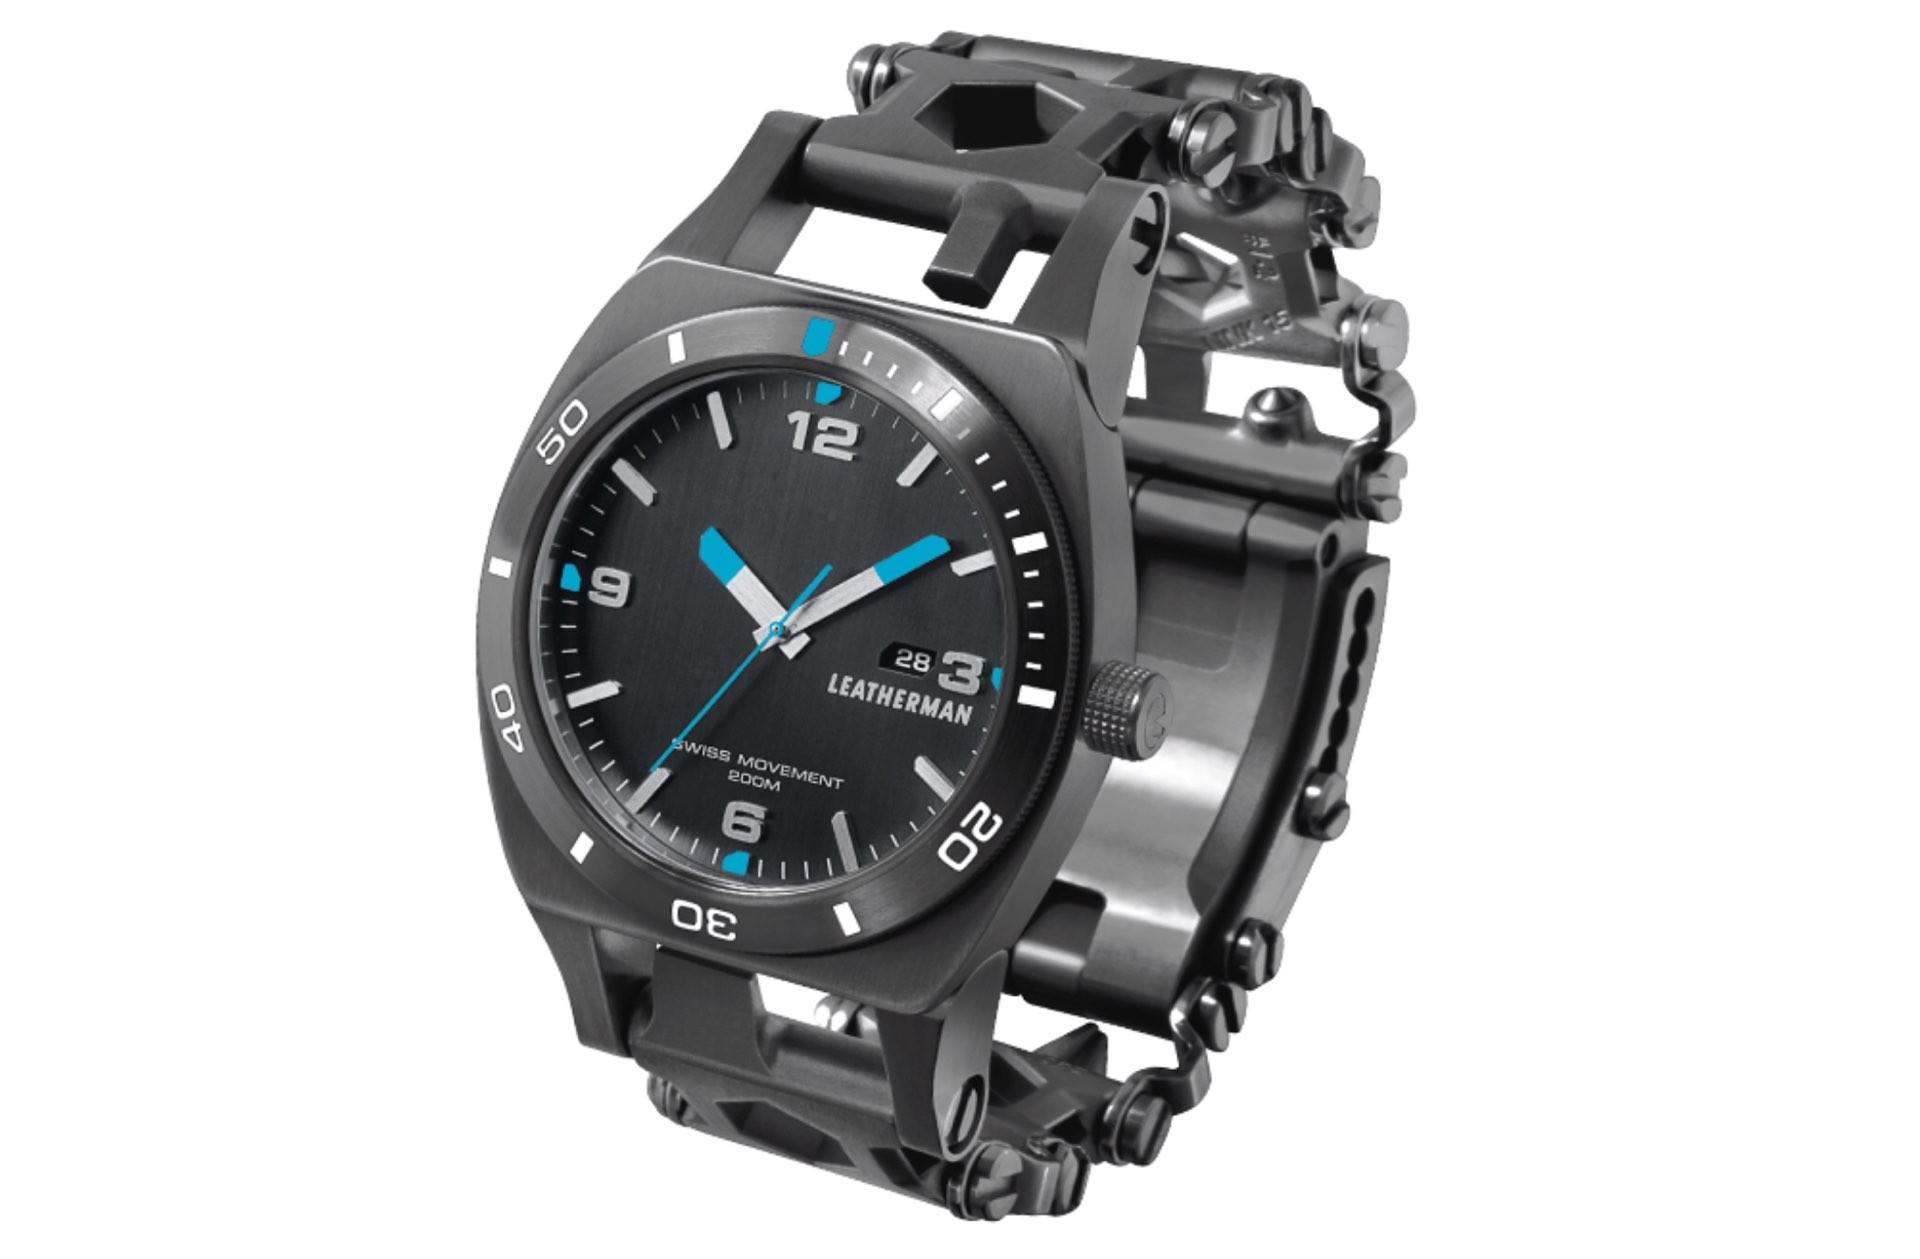 Leatherman's Tread Tempo multi-tool watch. ($450)